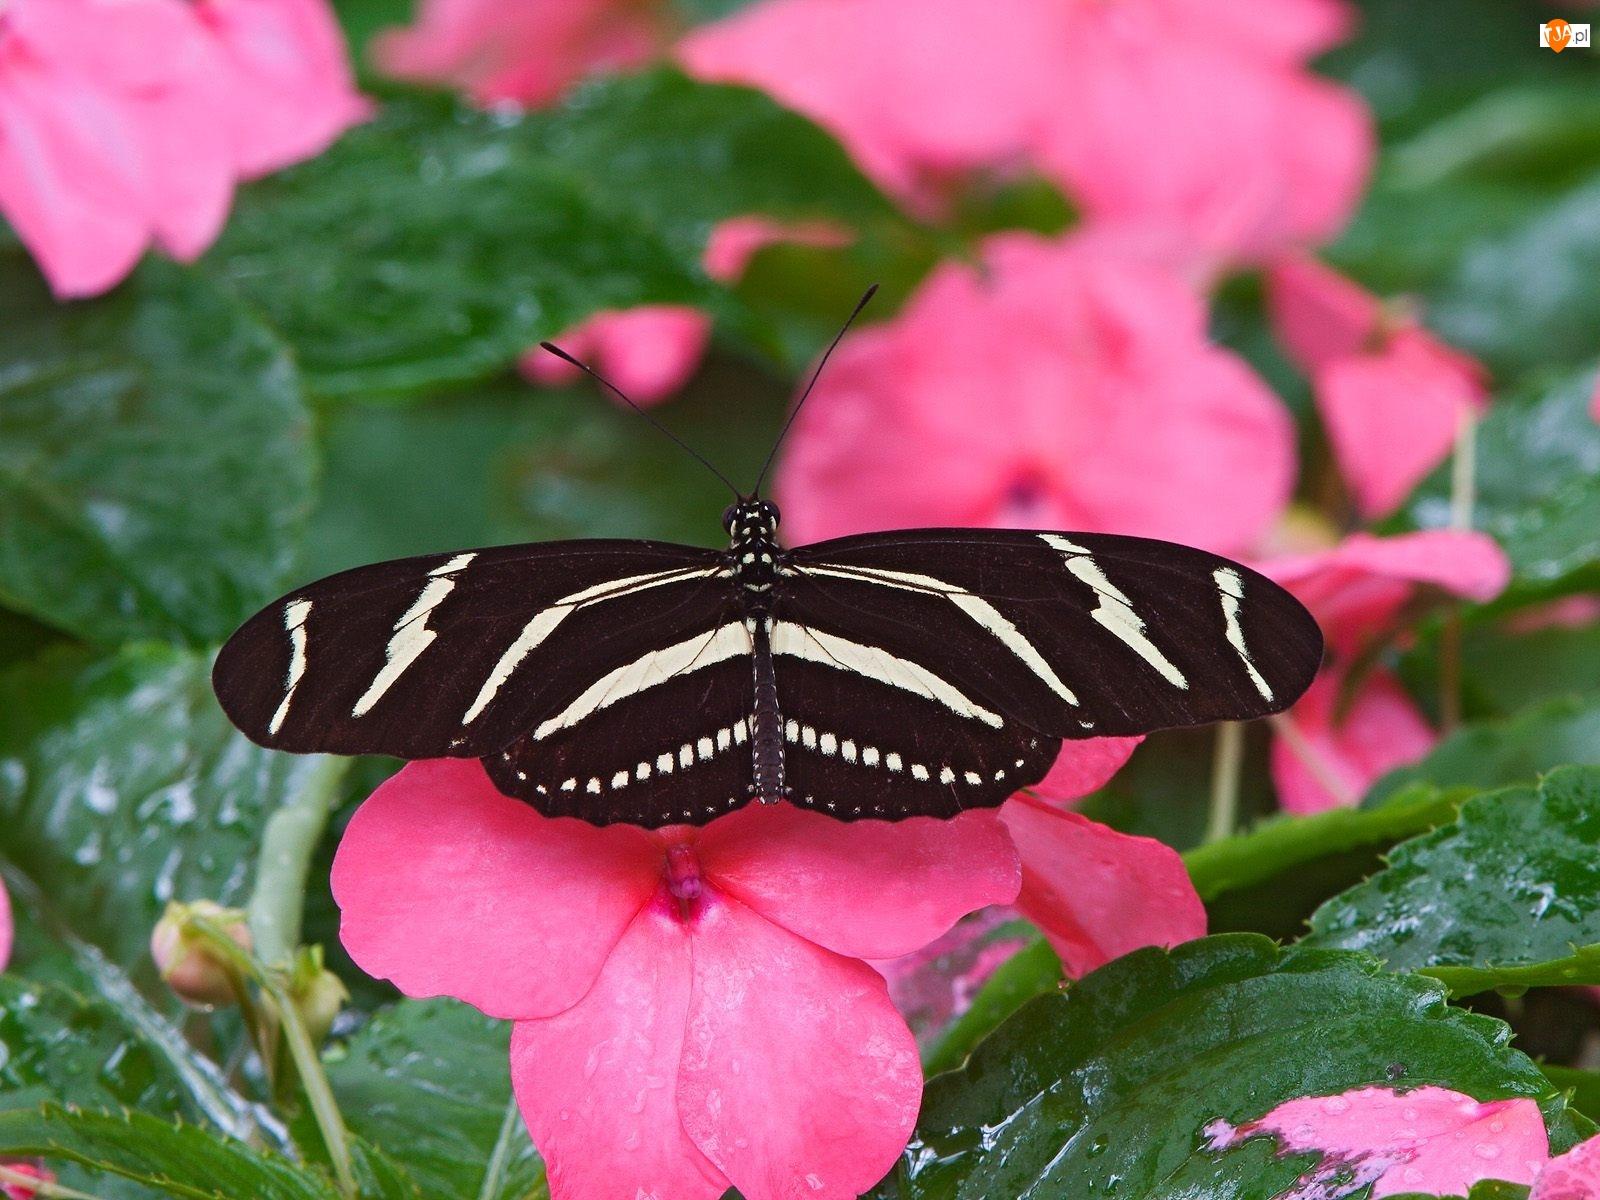 niecierpek, Motyl, kwiat